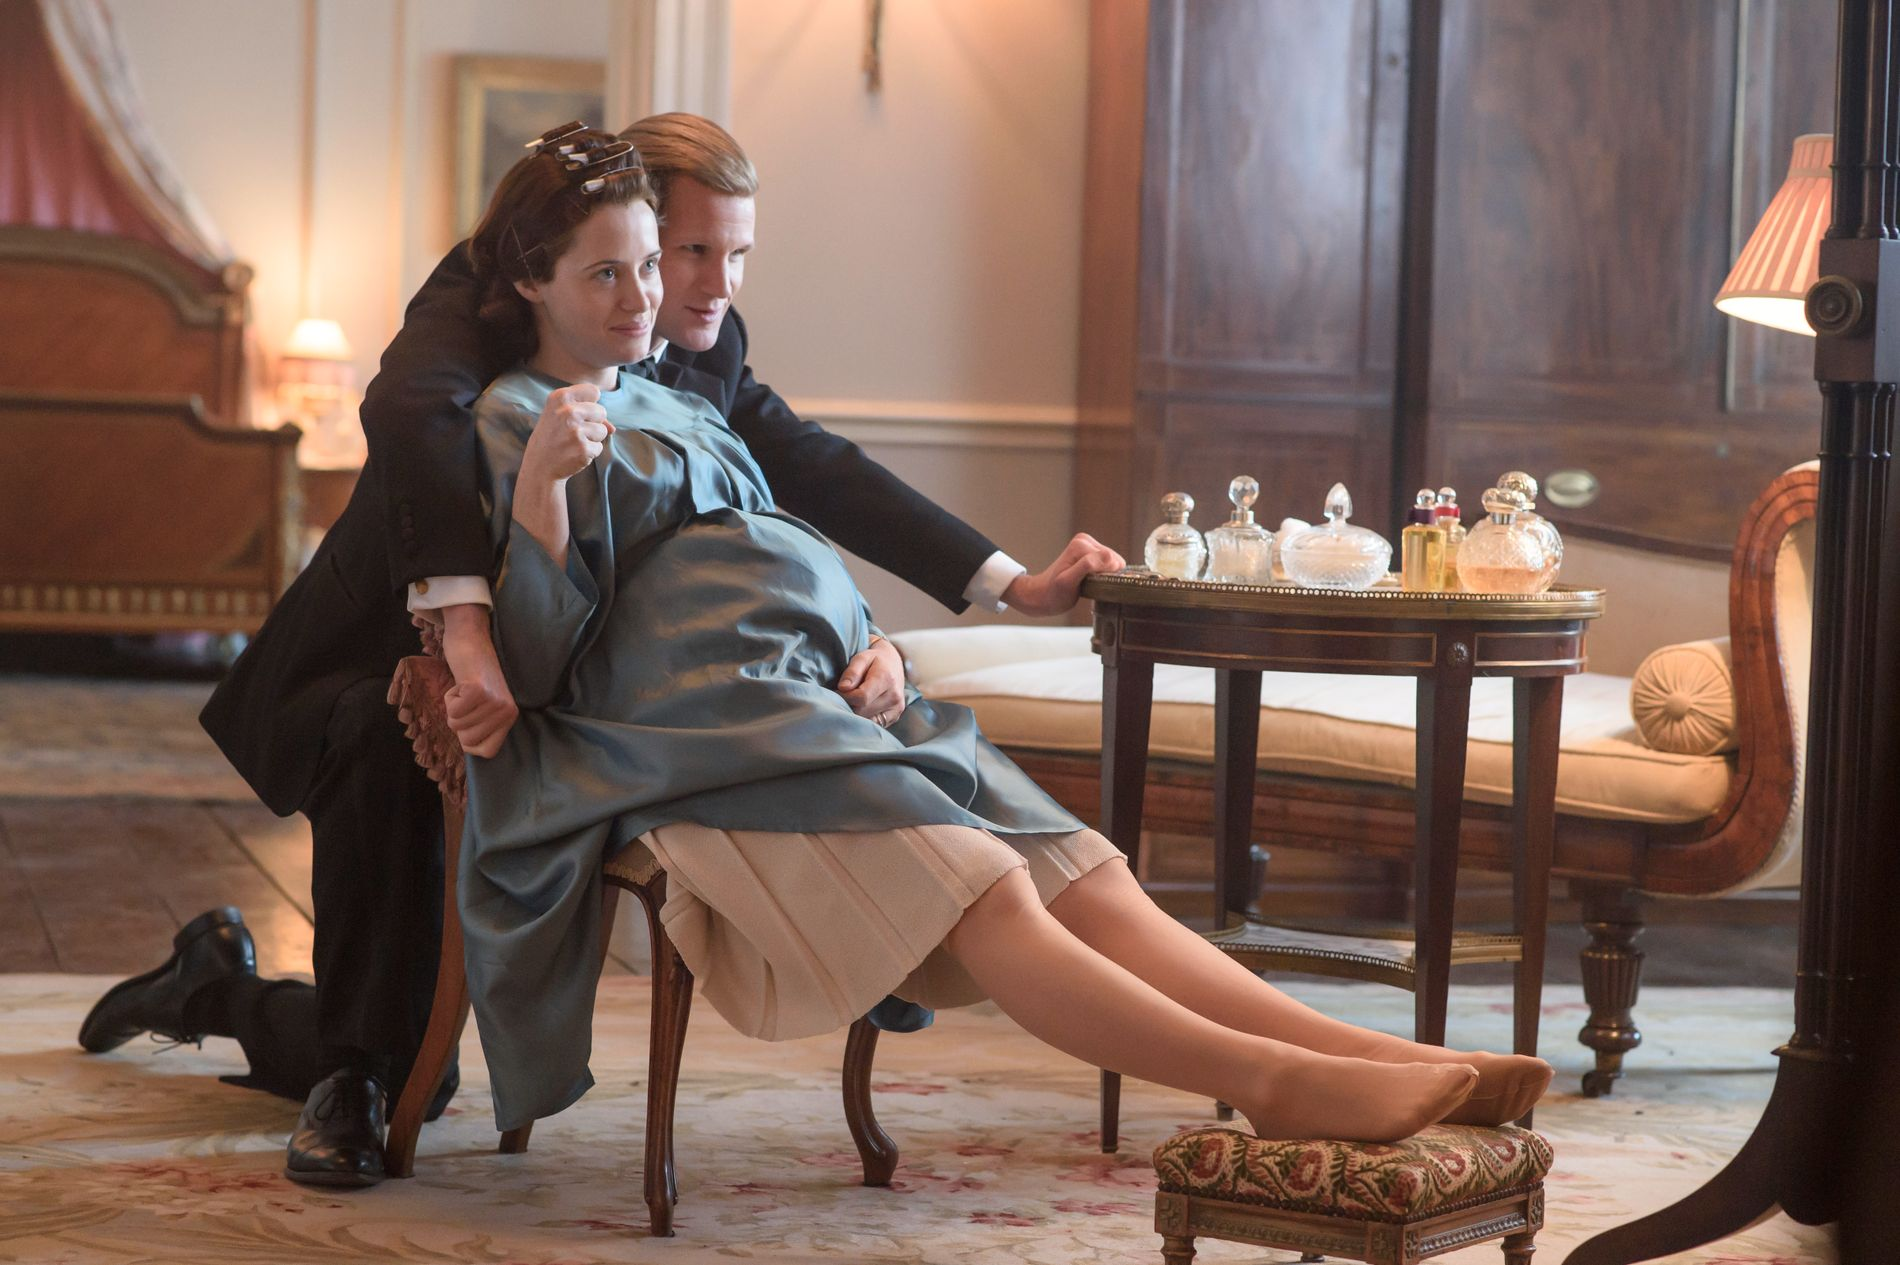 HISTORISK DRAMA: Claire Foy som dronning Elisabeth II og Matt Smith som hertugen av Edinburgh. FOTO: Netflix